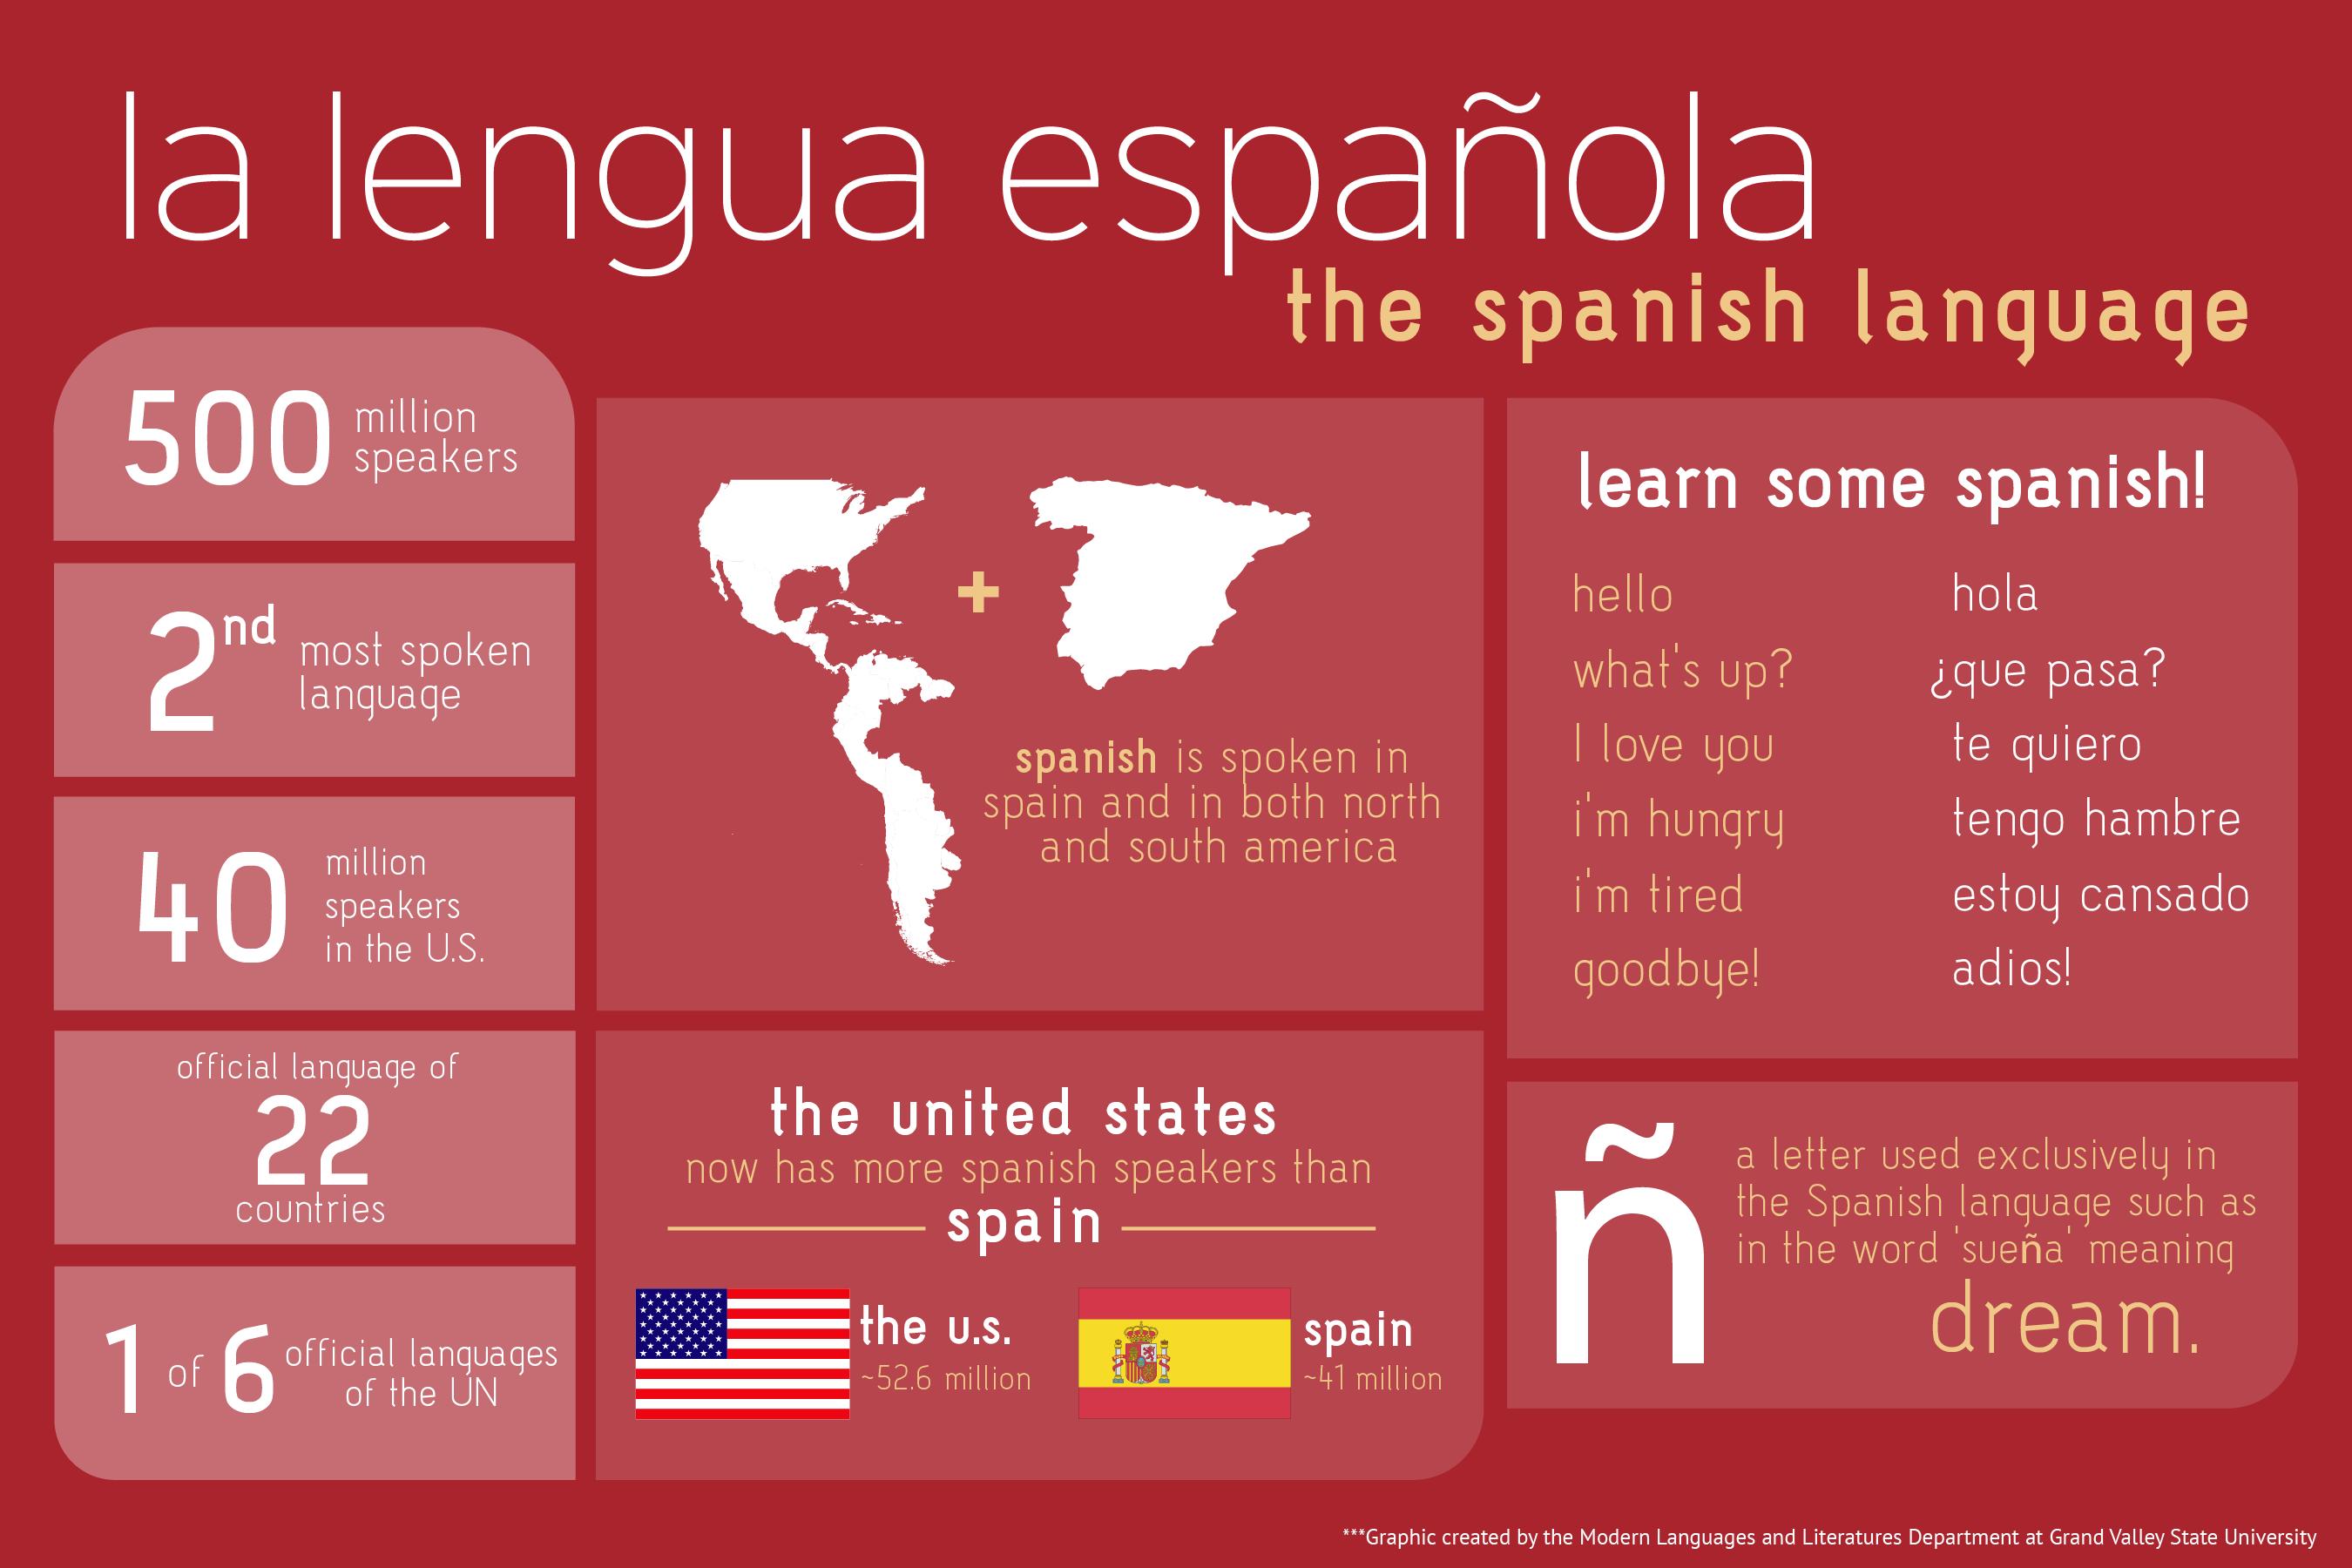 Porno en idioma español